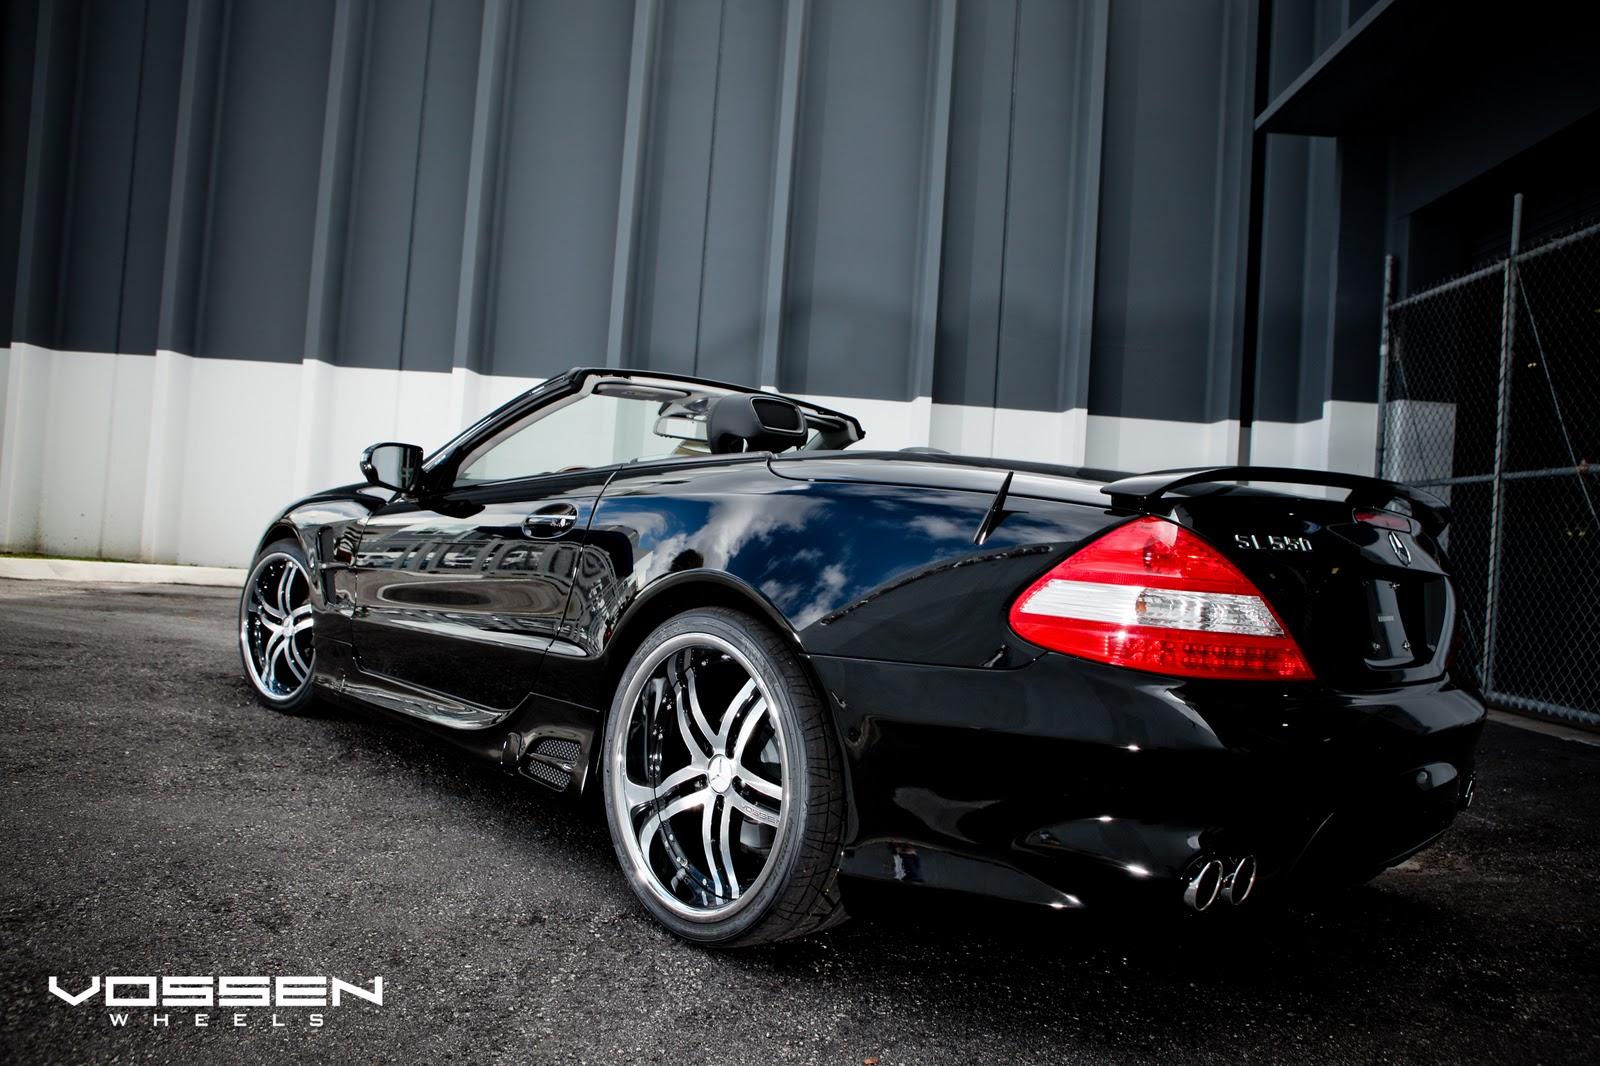 http://1.bp.blogspot.com/_v5h2qxDB1io/TTv7PWkdQJI/AAAAAAAABhk/umsFeKvuxZ0/s1600/Mercedes-Benz+SL550+Black.jpg